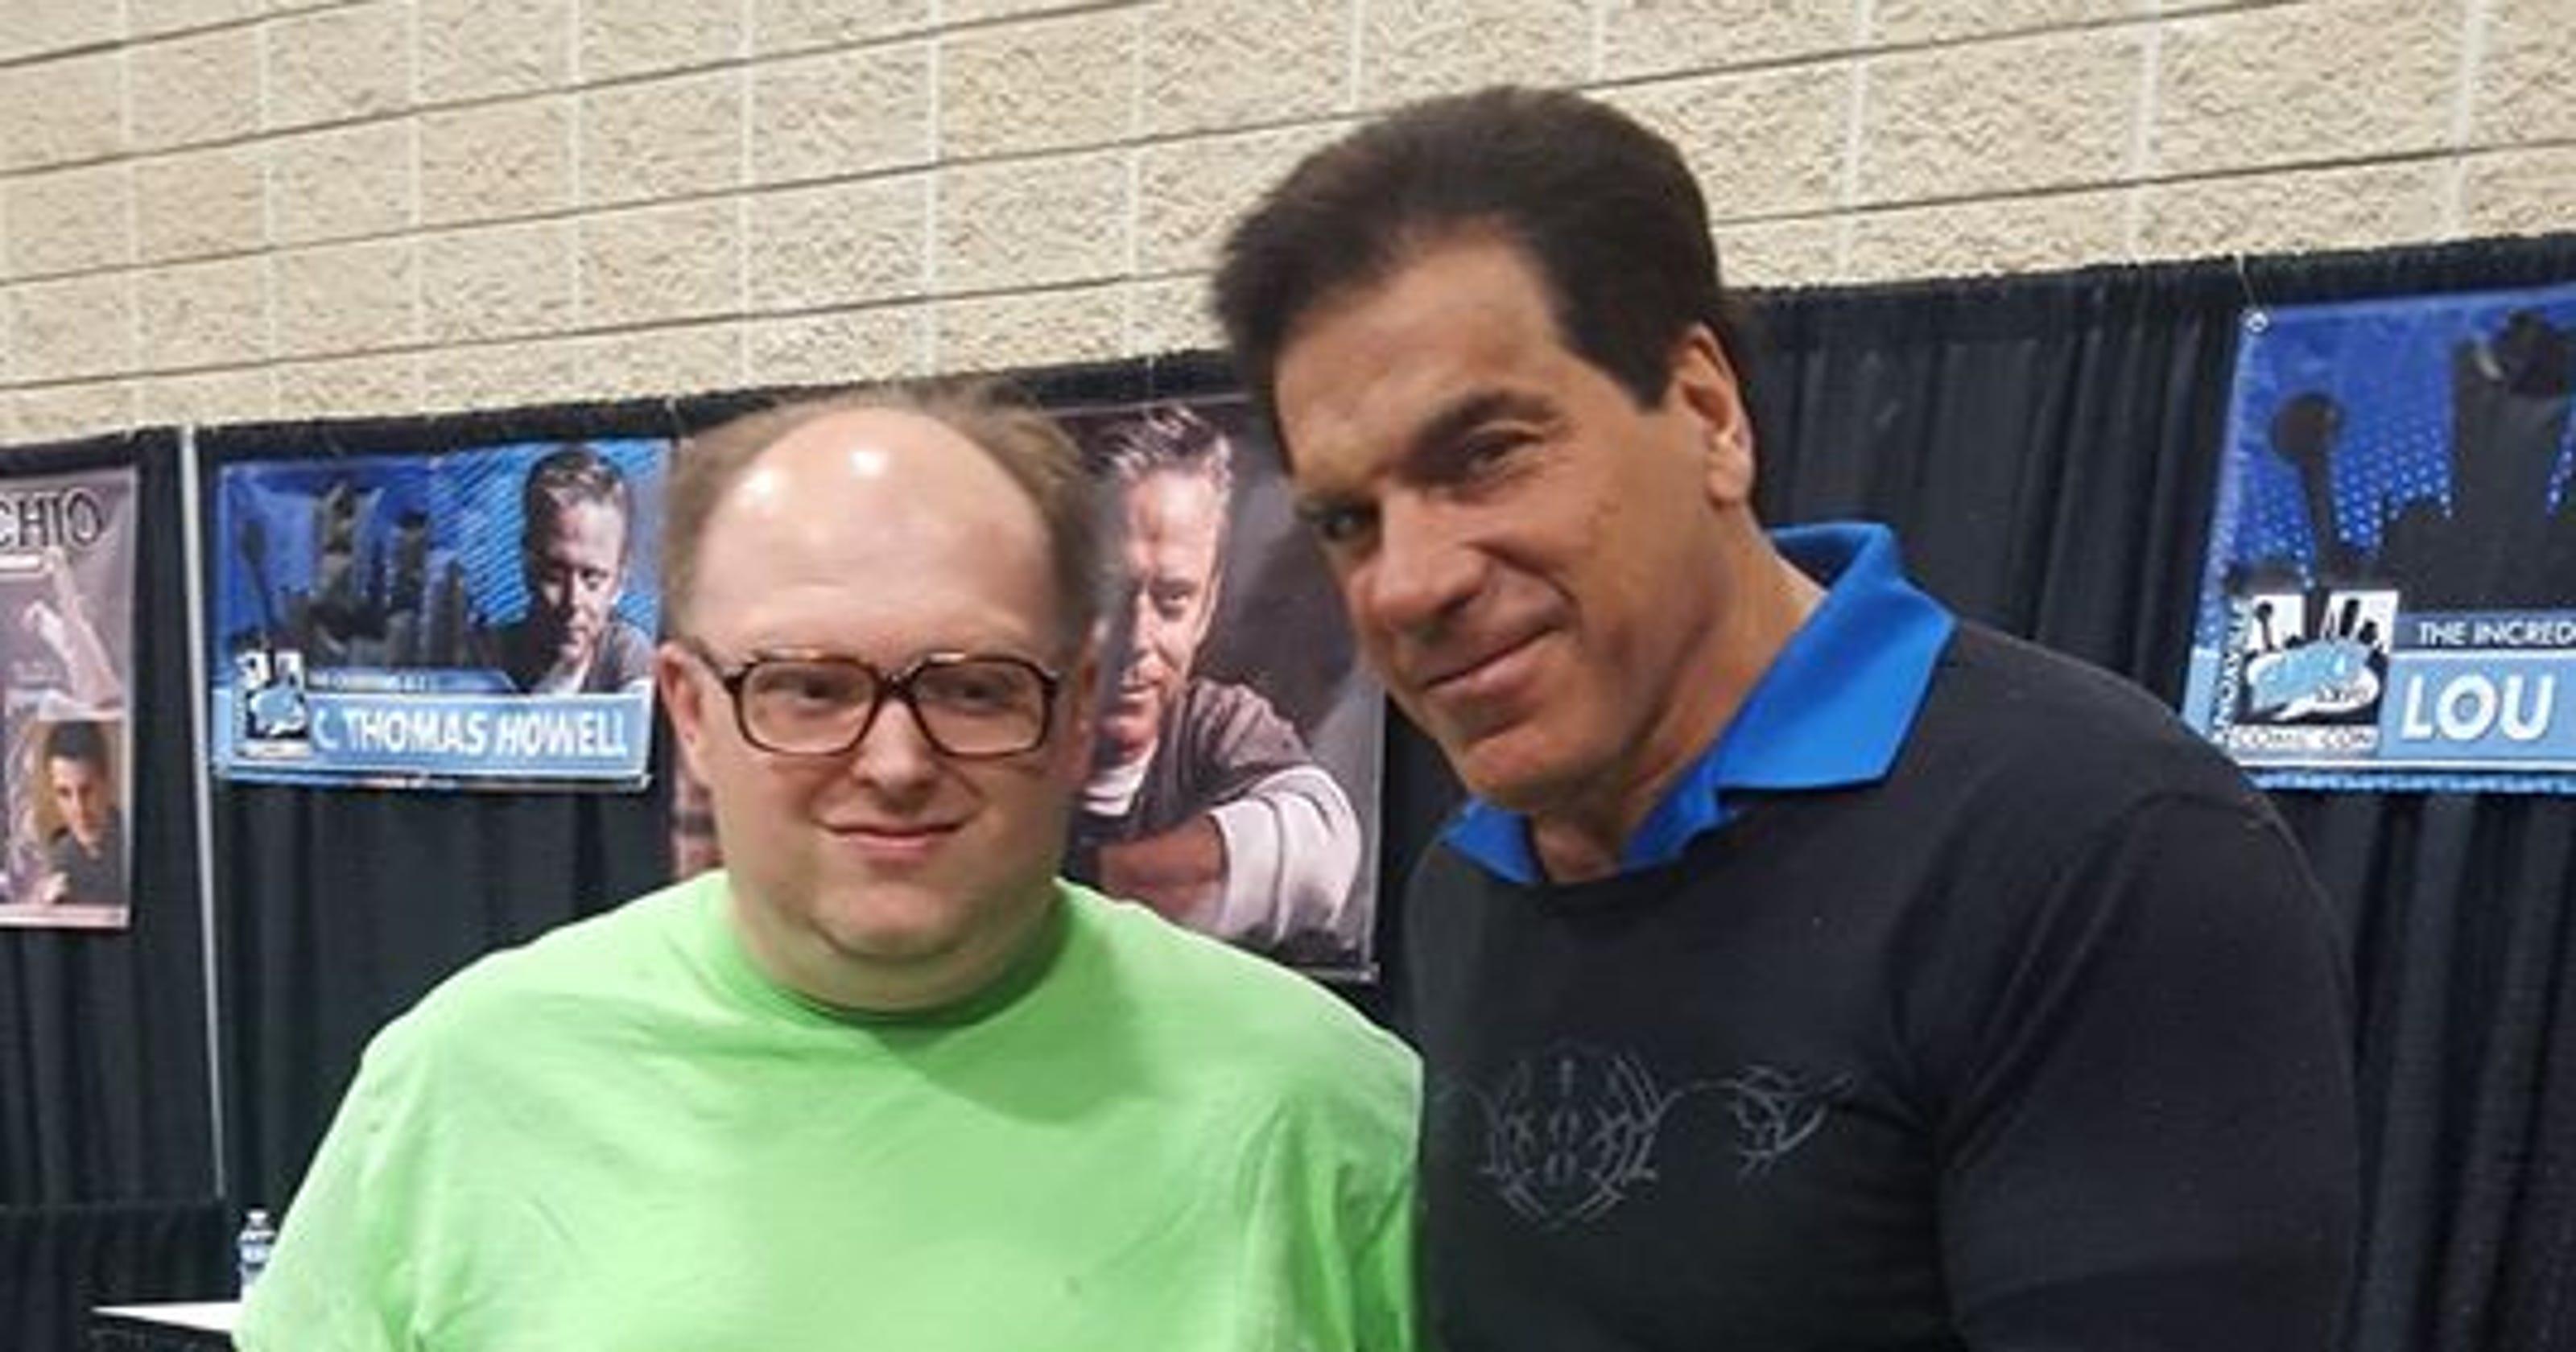 'Incredible Hulk' Lou Ferrigno helps Knoxville Comic Con ...